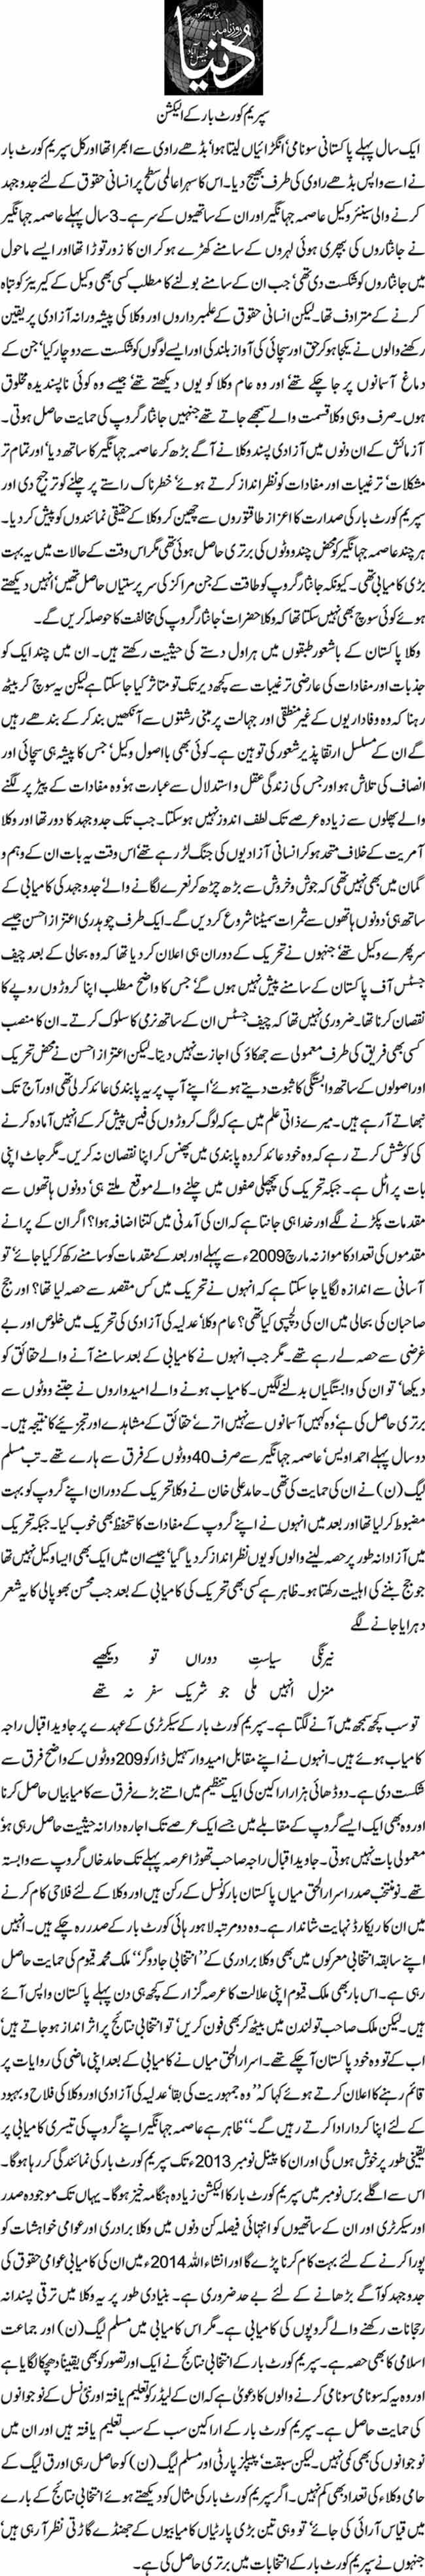 Supreme Court baar k election - Nazeer Naji